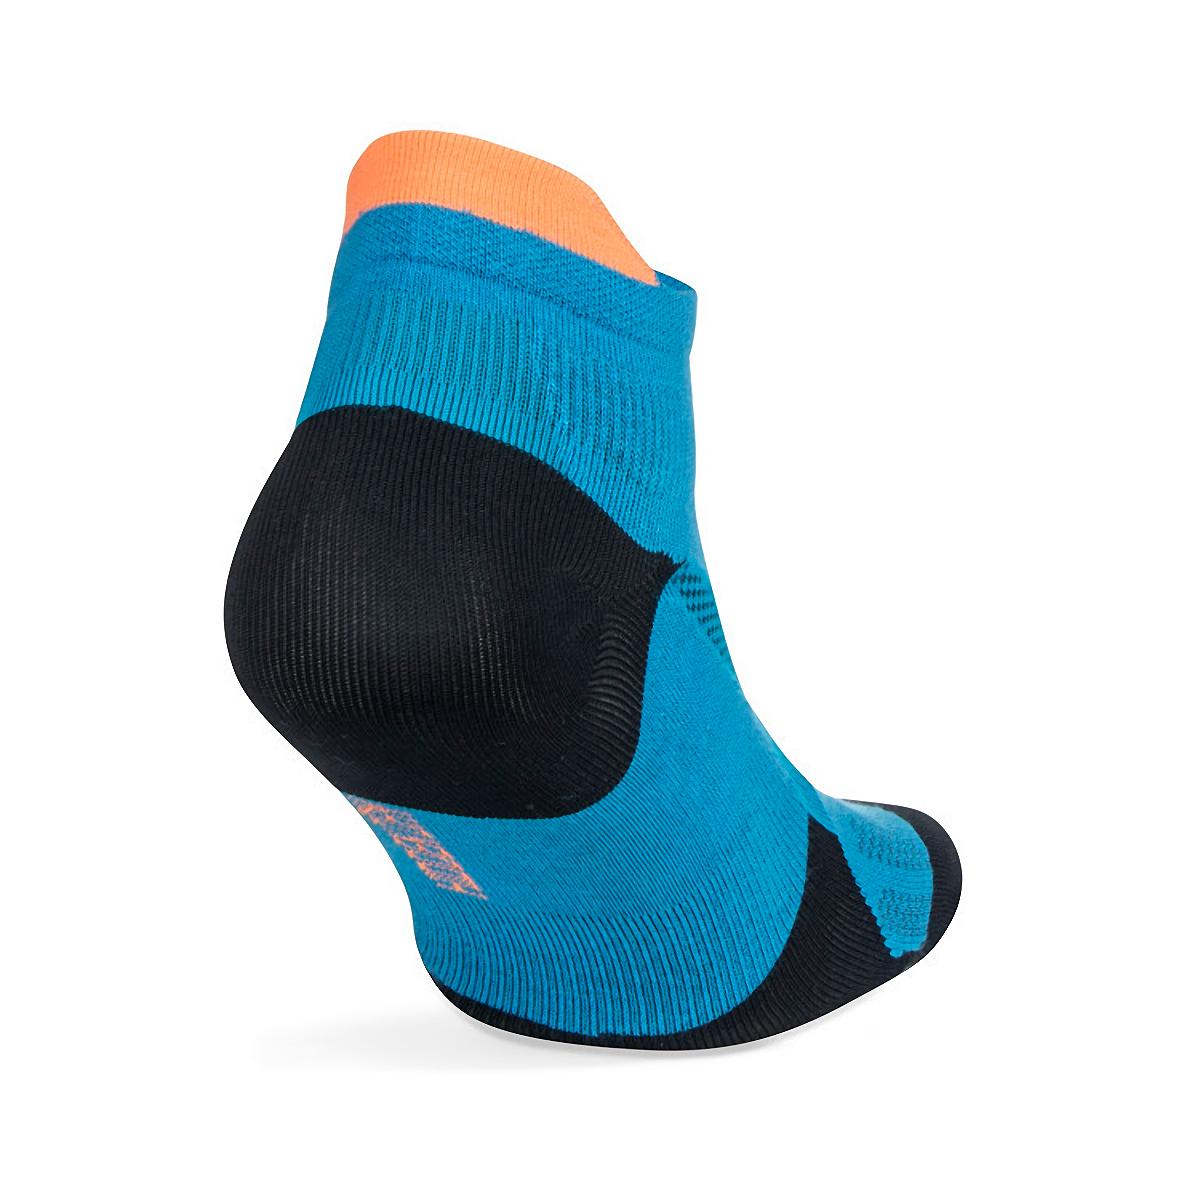 Balega Hidden Dry No Show Socks - Color: Bright Turquoise/Navy - Size: S, Bright Turquoise/Navy, large, image 4